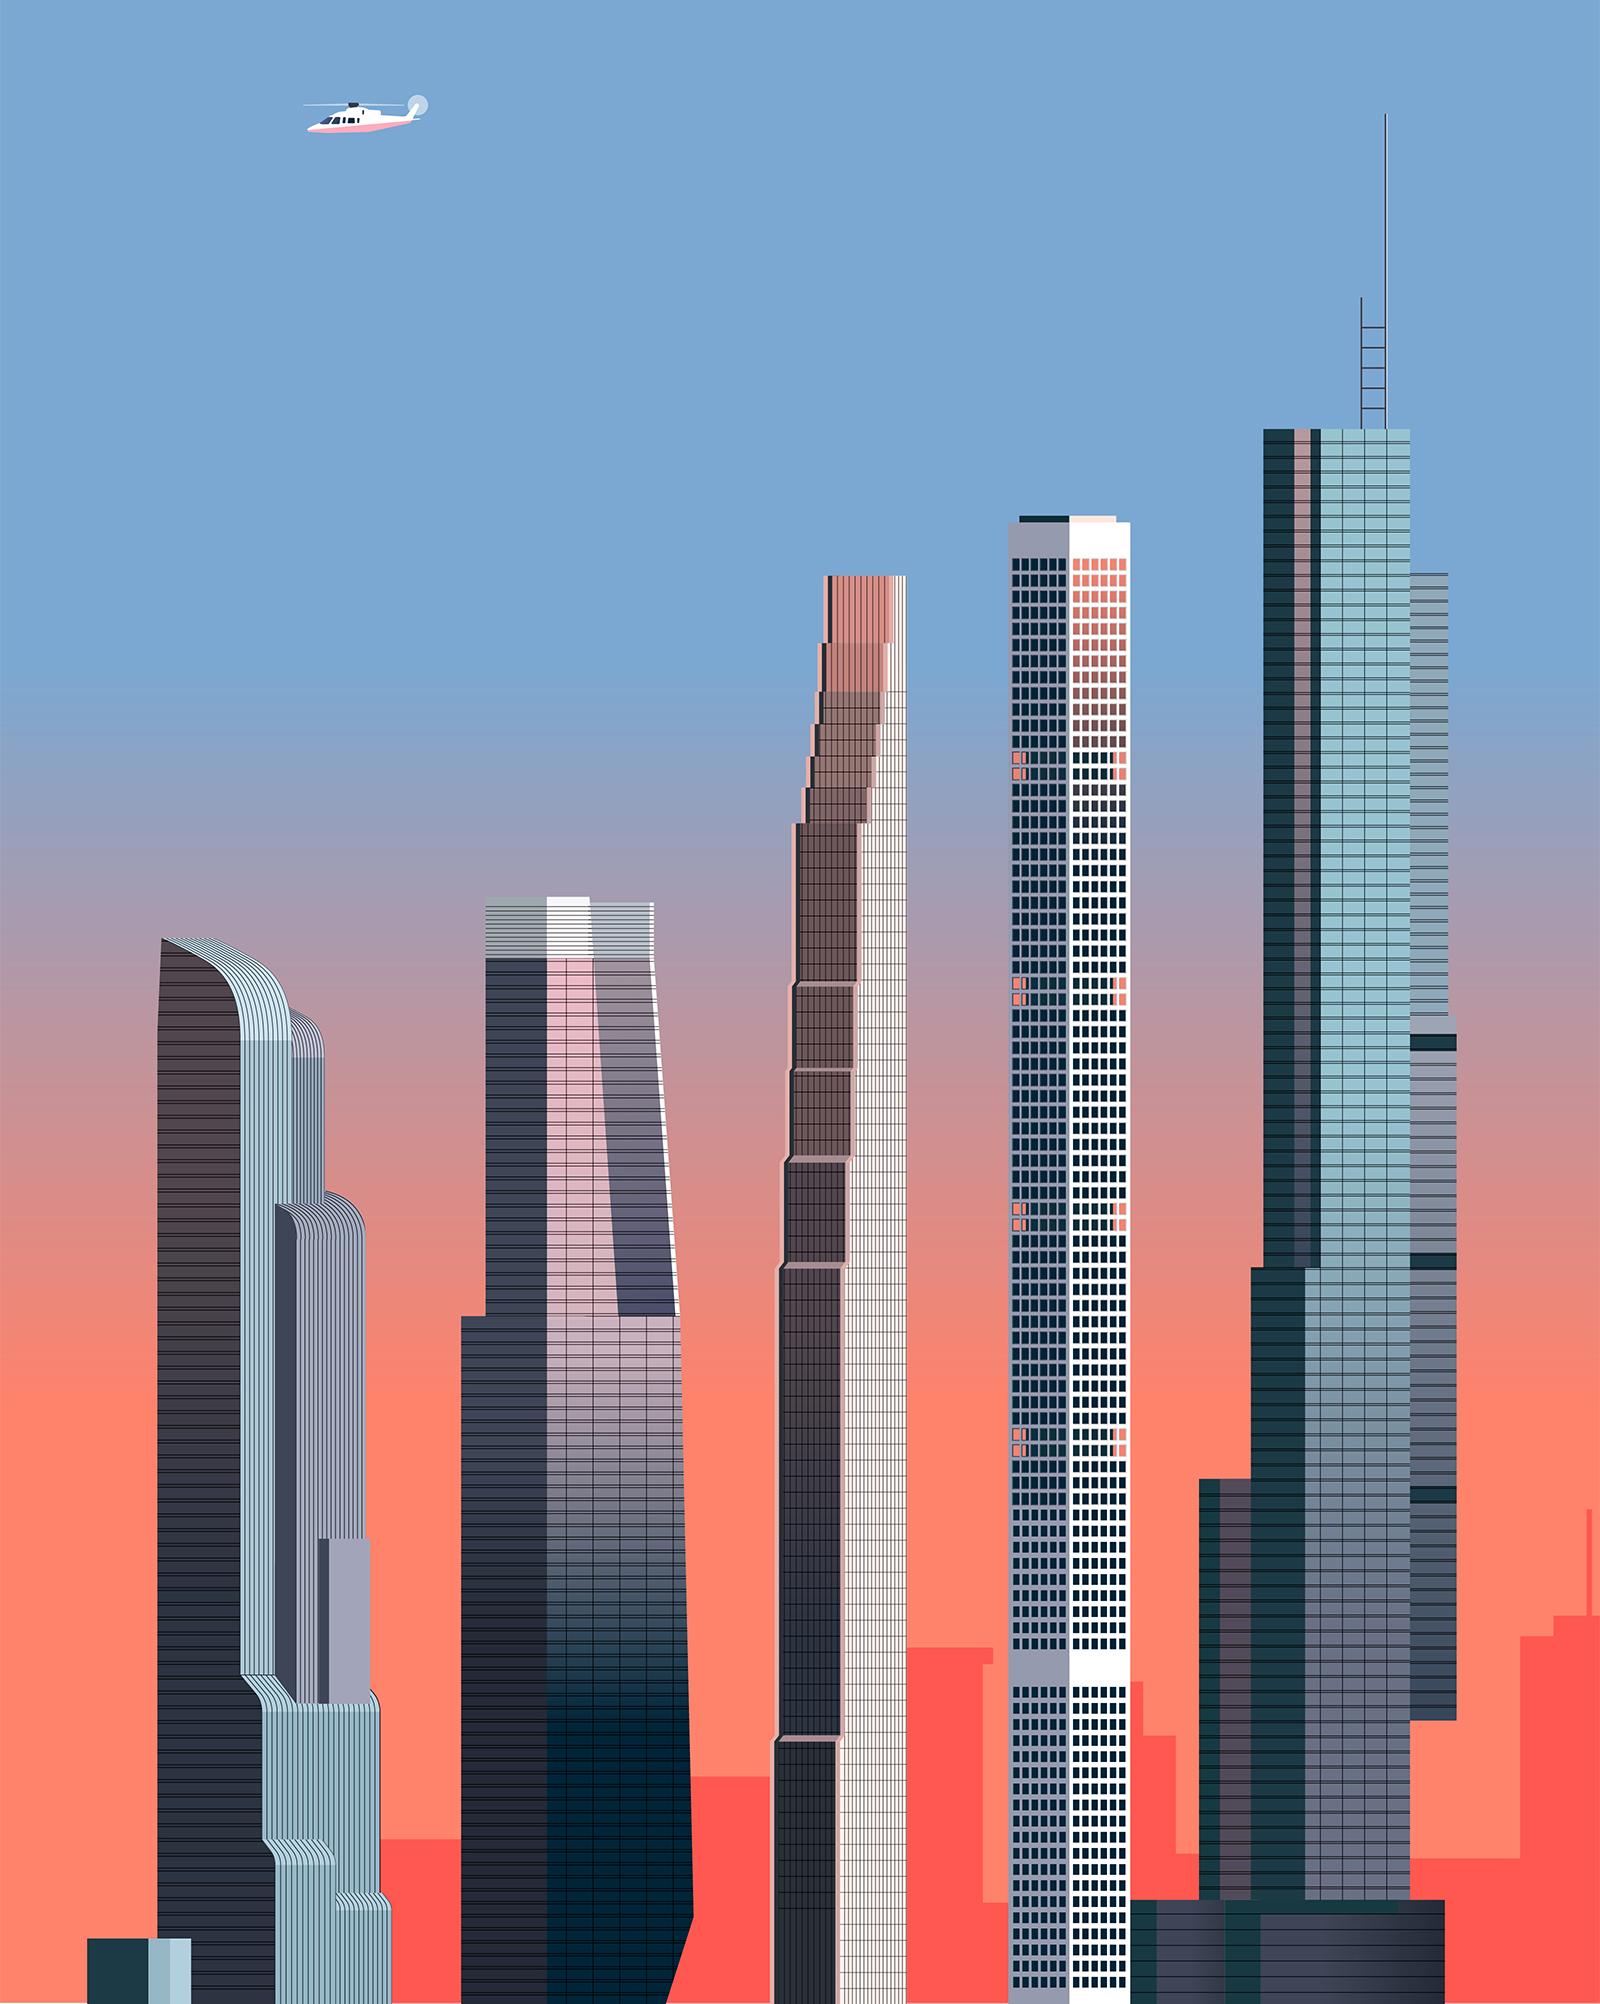 New York skyscraper vector illustration for Wired